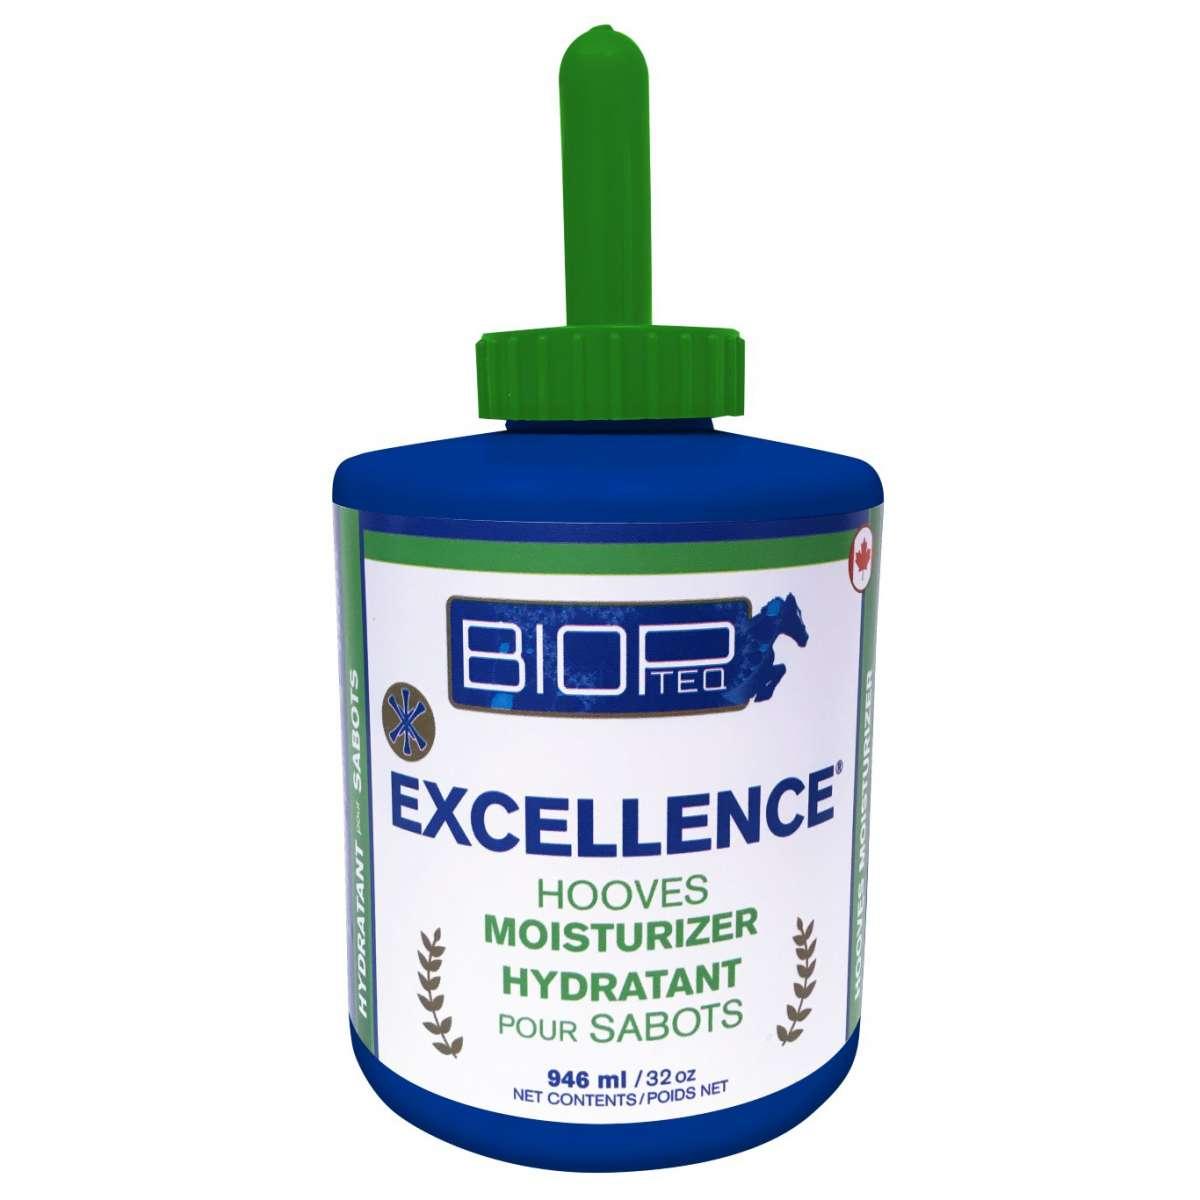 BioPTeq Excellence Hoof Moisturizer   Eaglewood Equestrian Supplies